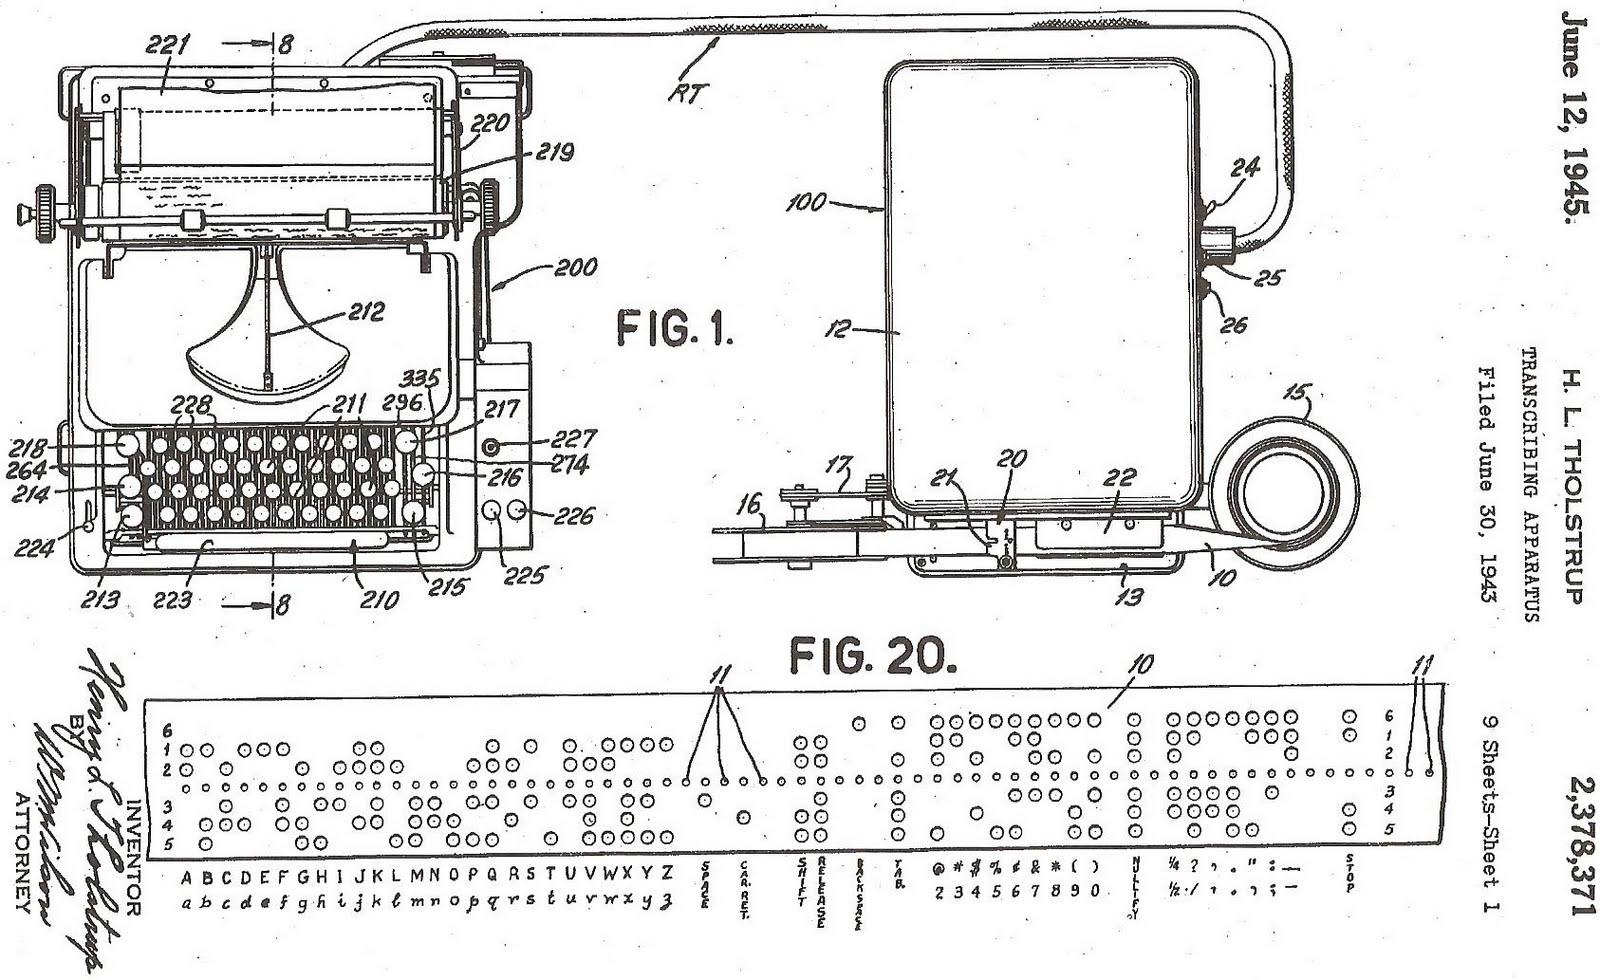 oz.Typewriter: On This Day in Typewriter History (LXVII)